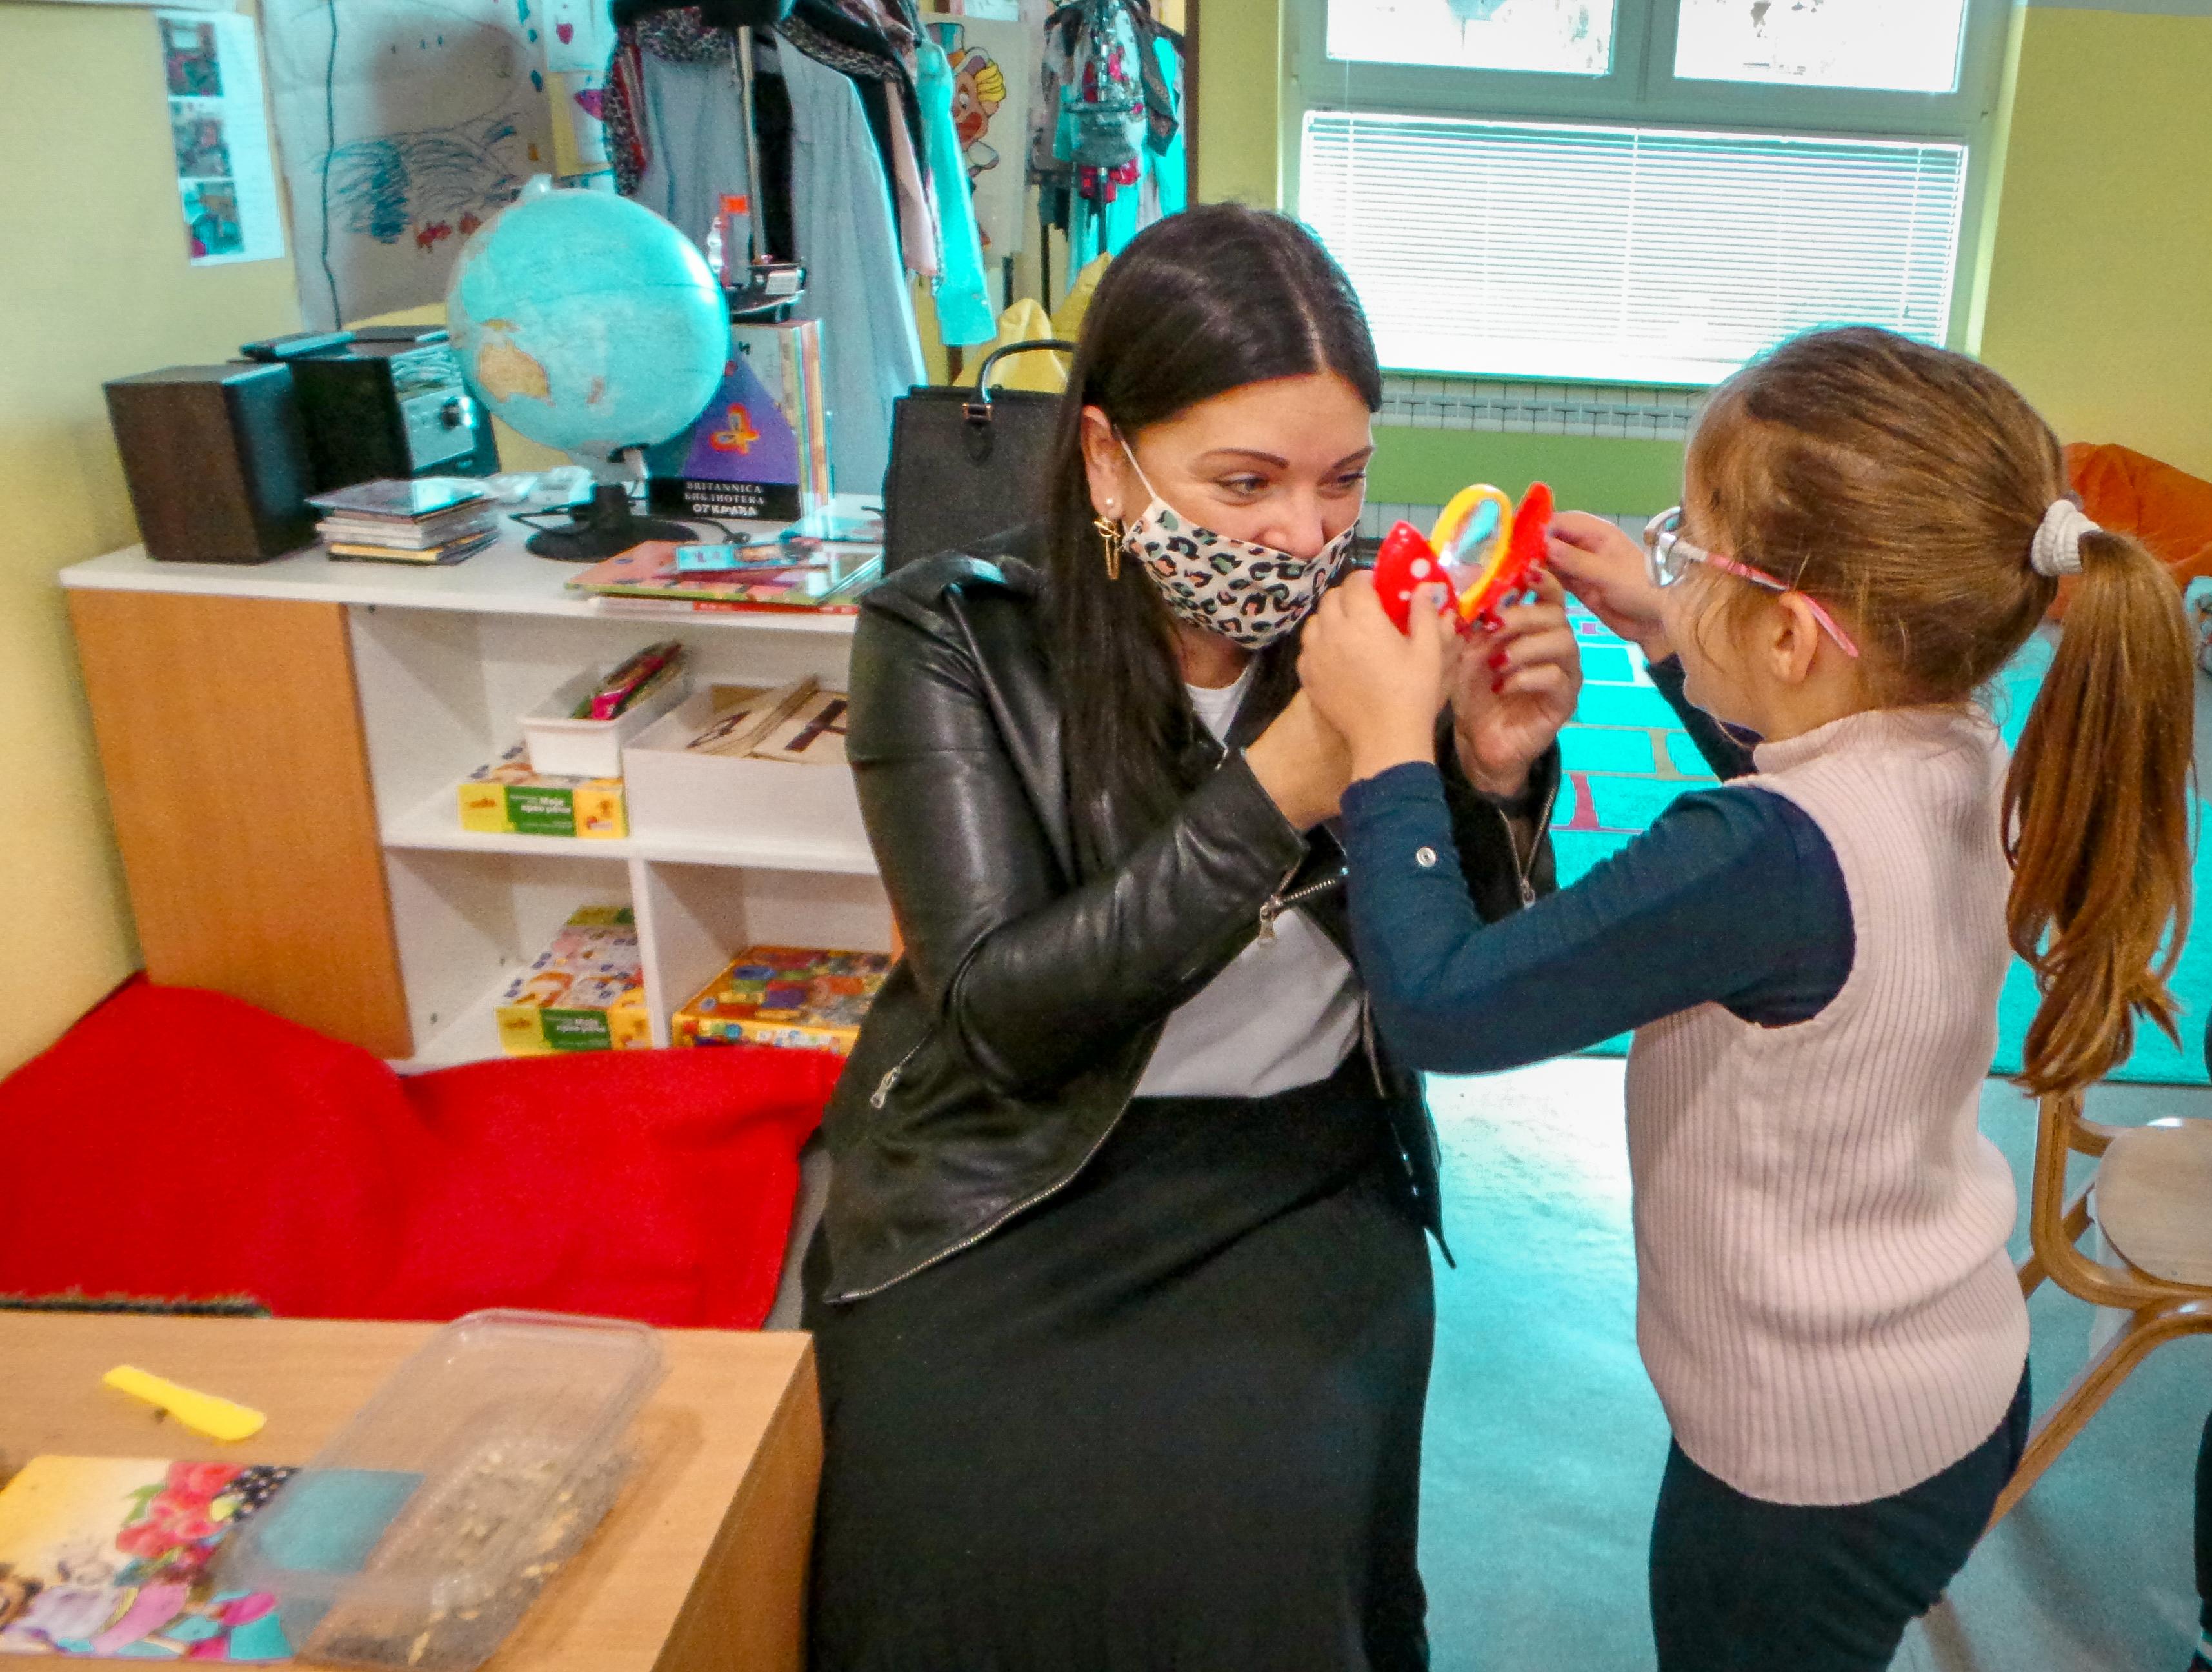 Velika strast Dragane Radišić je humanitarni rad i pomaganje da se što većem broju dece širom sveta obezbede bolji uslovi za život.